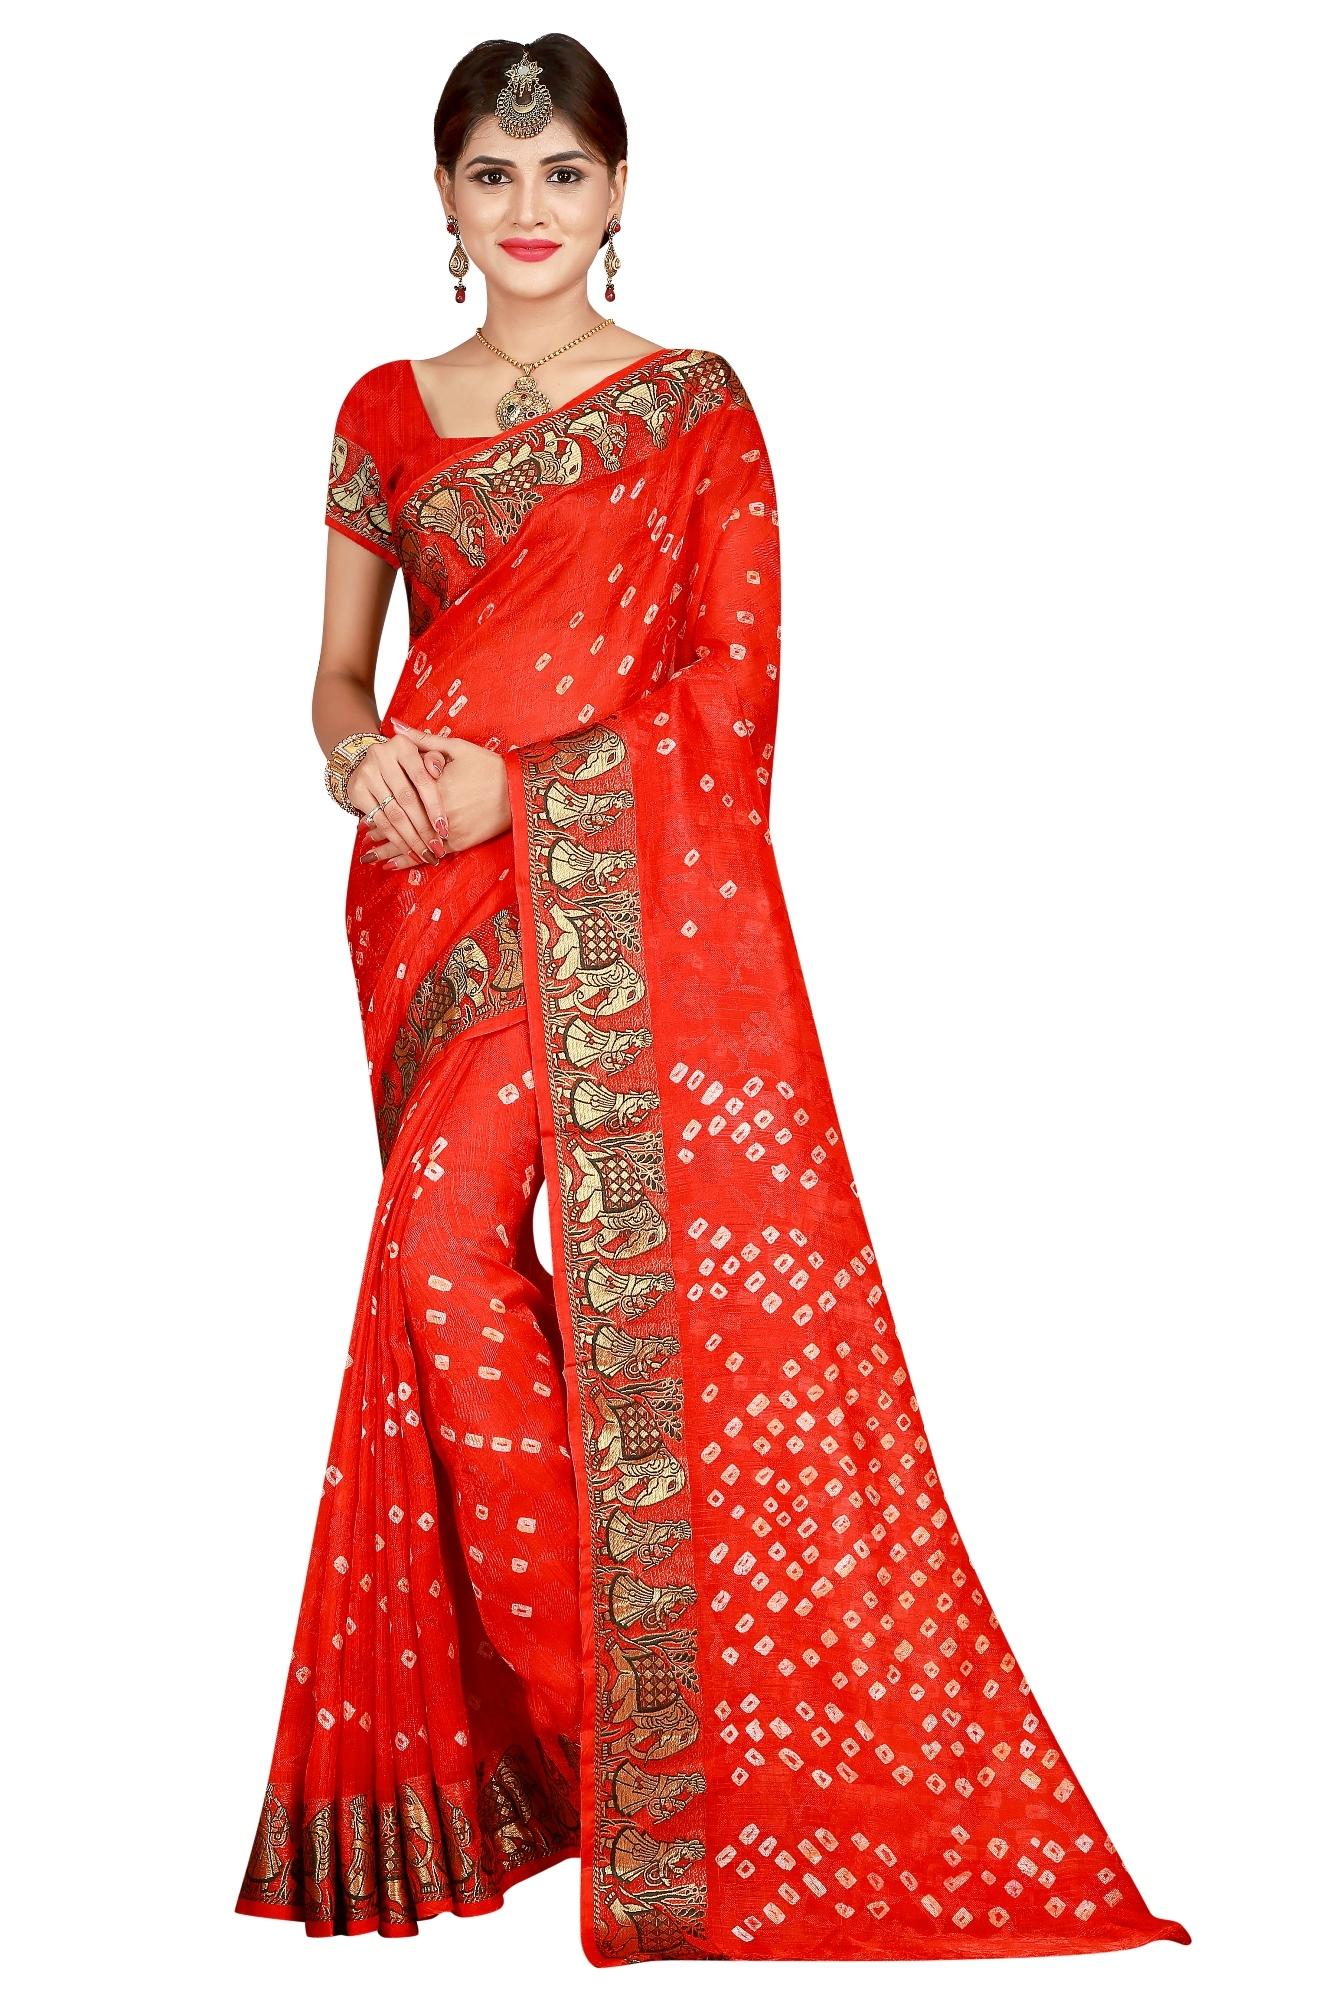 Elephant Design Pure cotton Saree with golden border